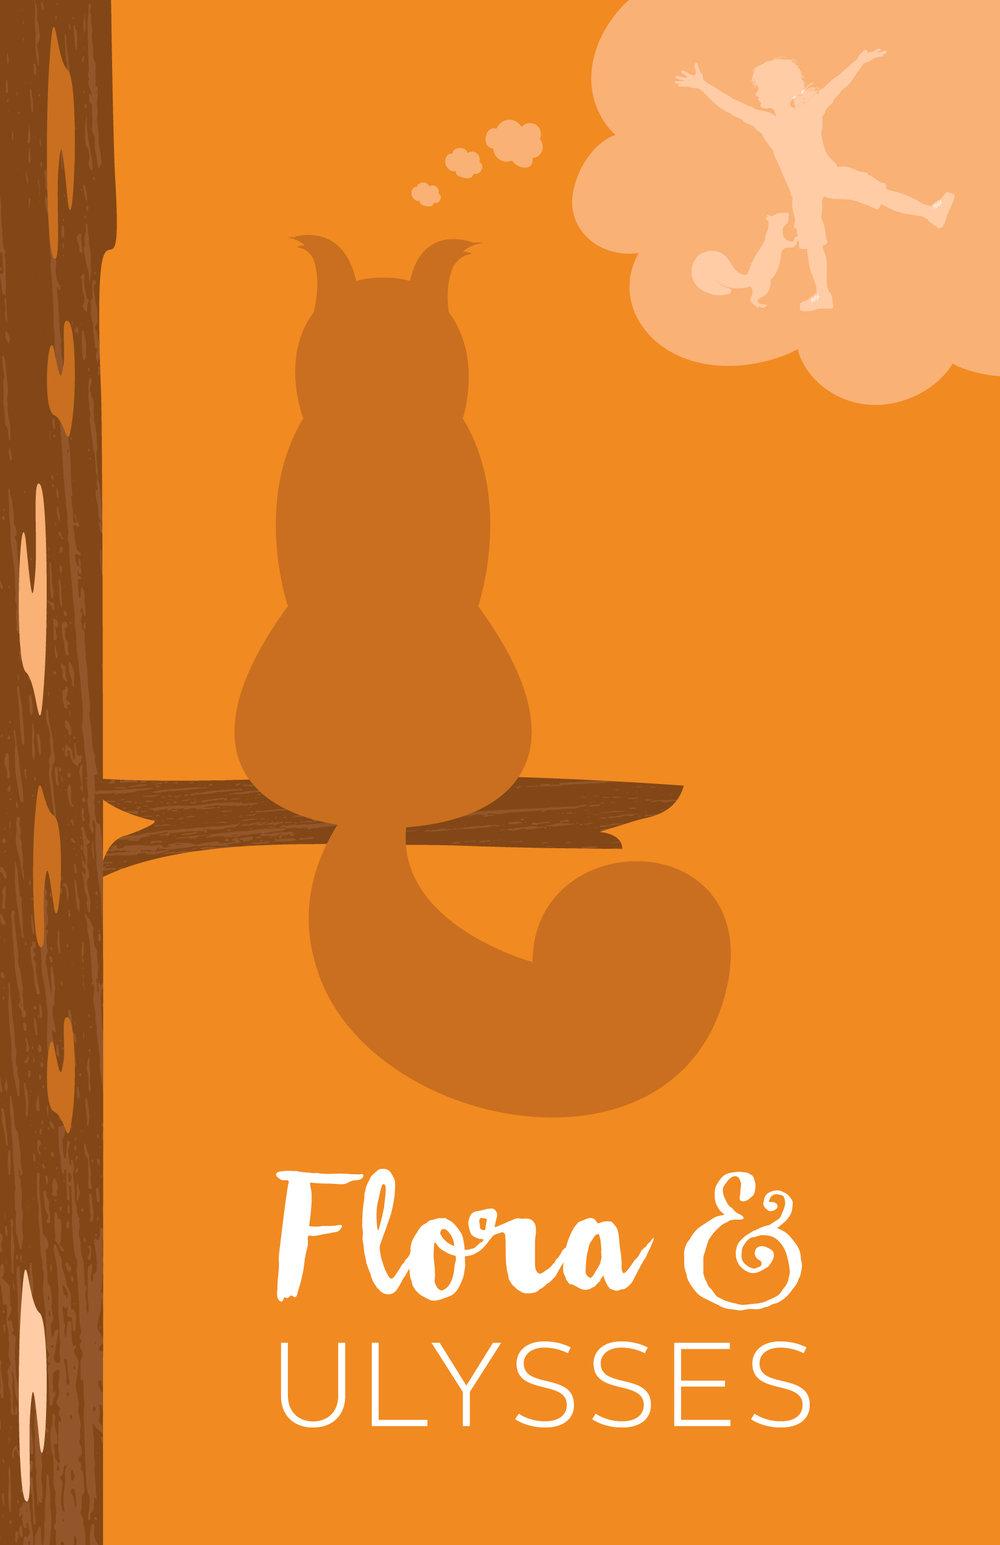 05-FLORA&ULYSSES-Vertical.jpg